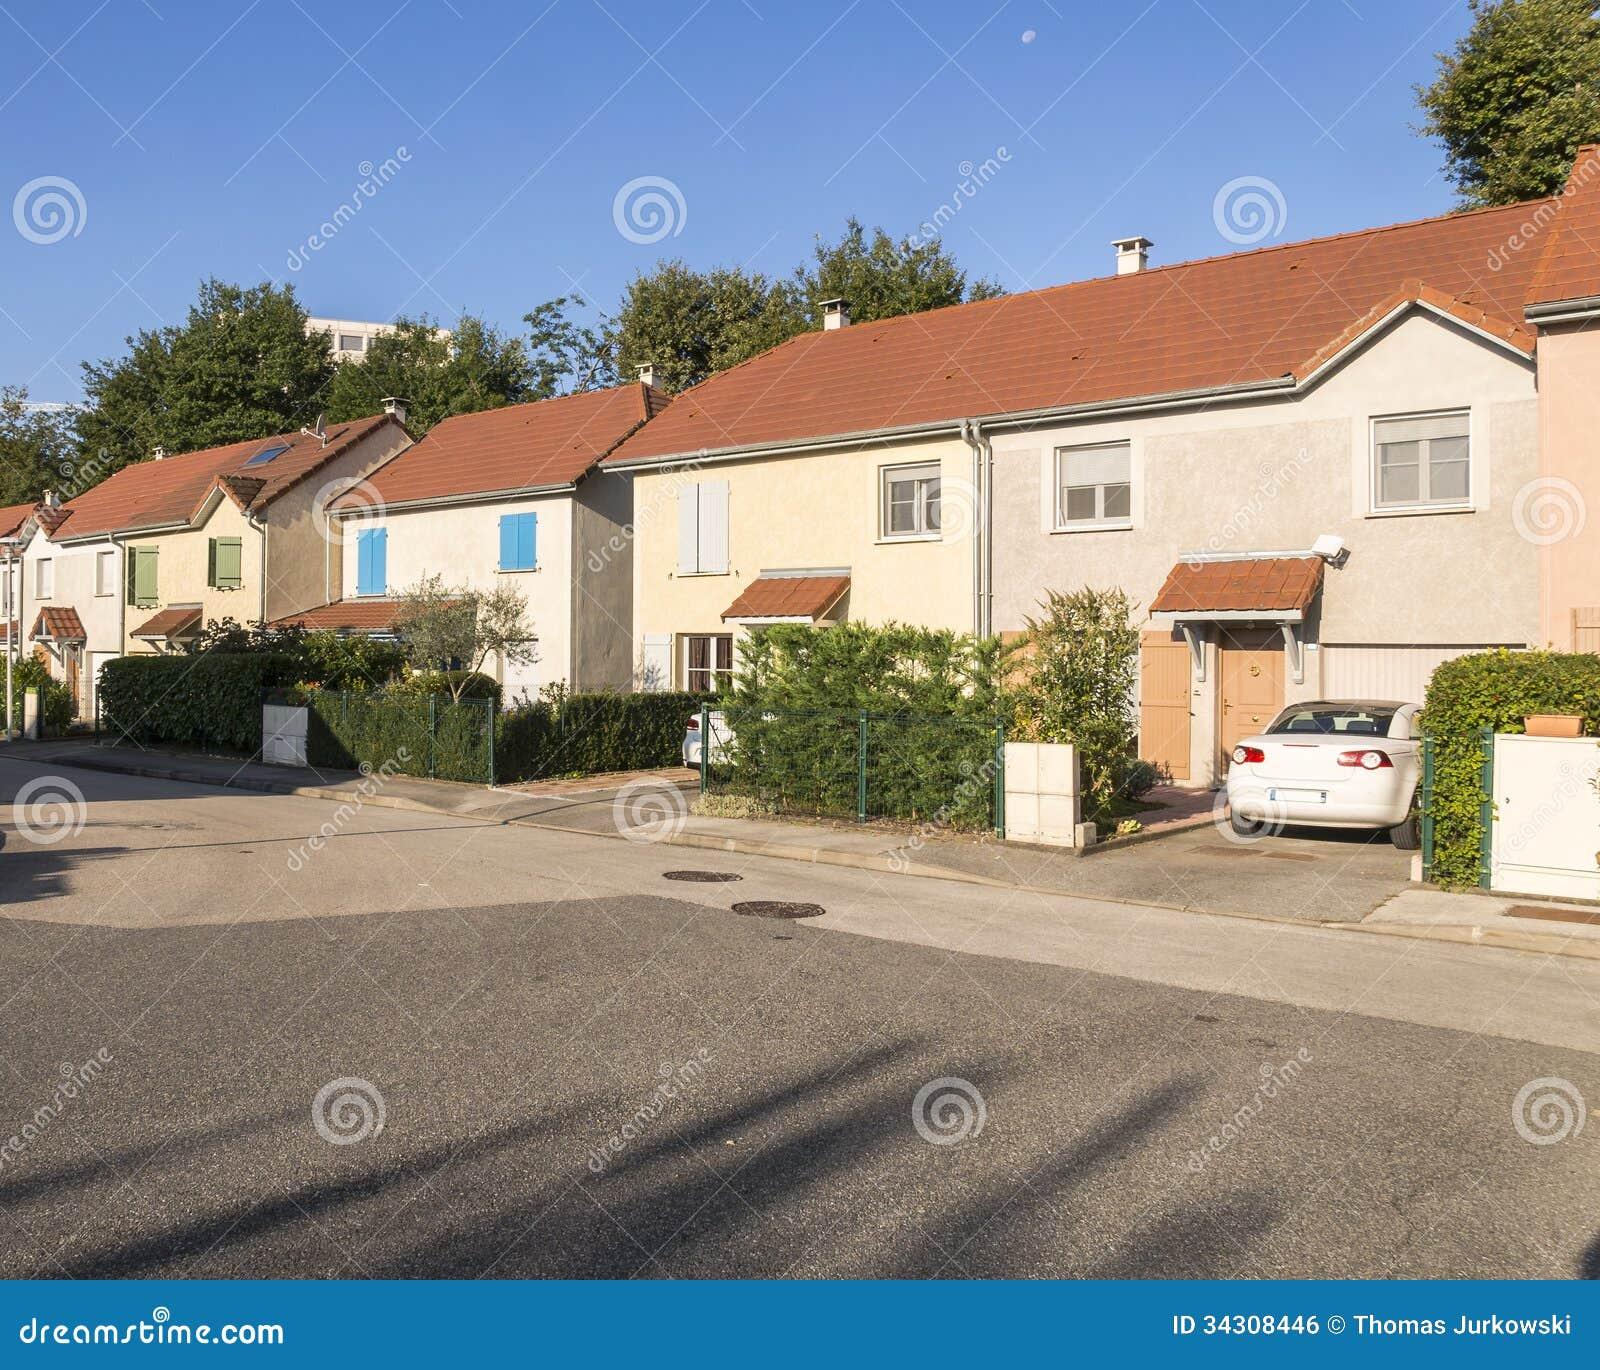 Development of small homes